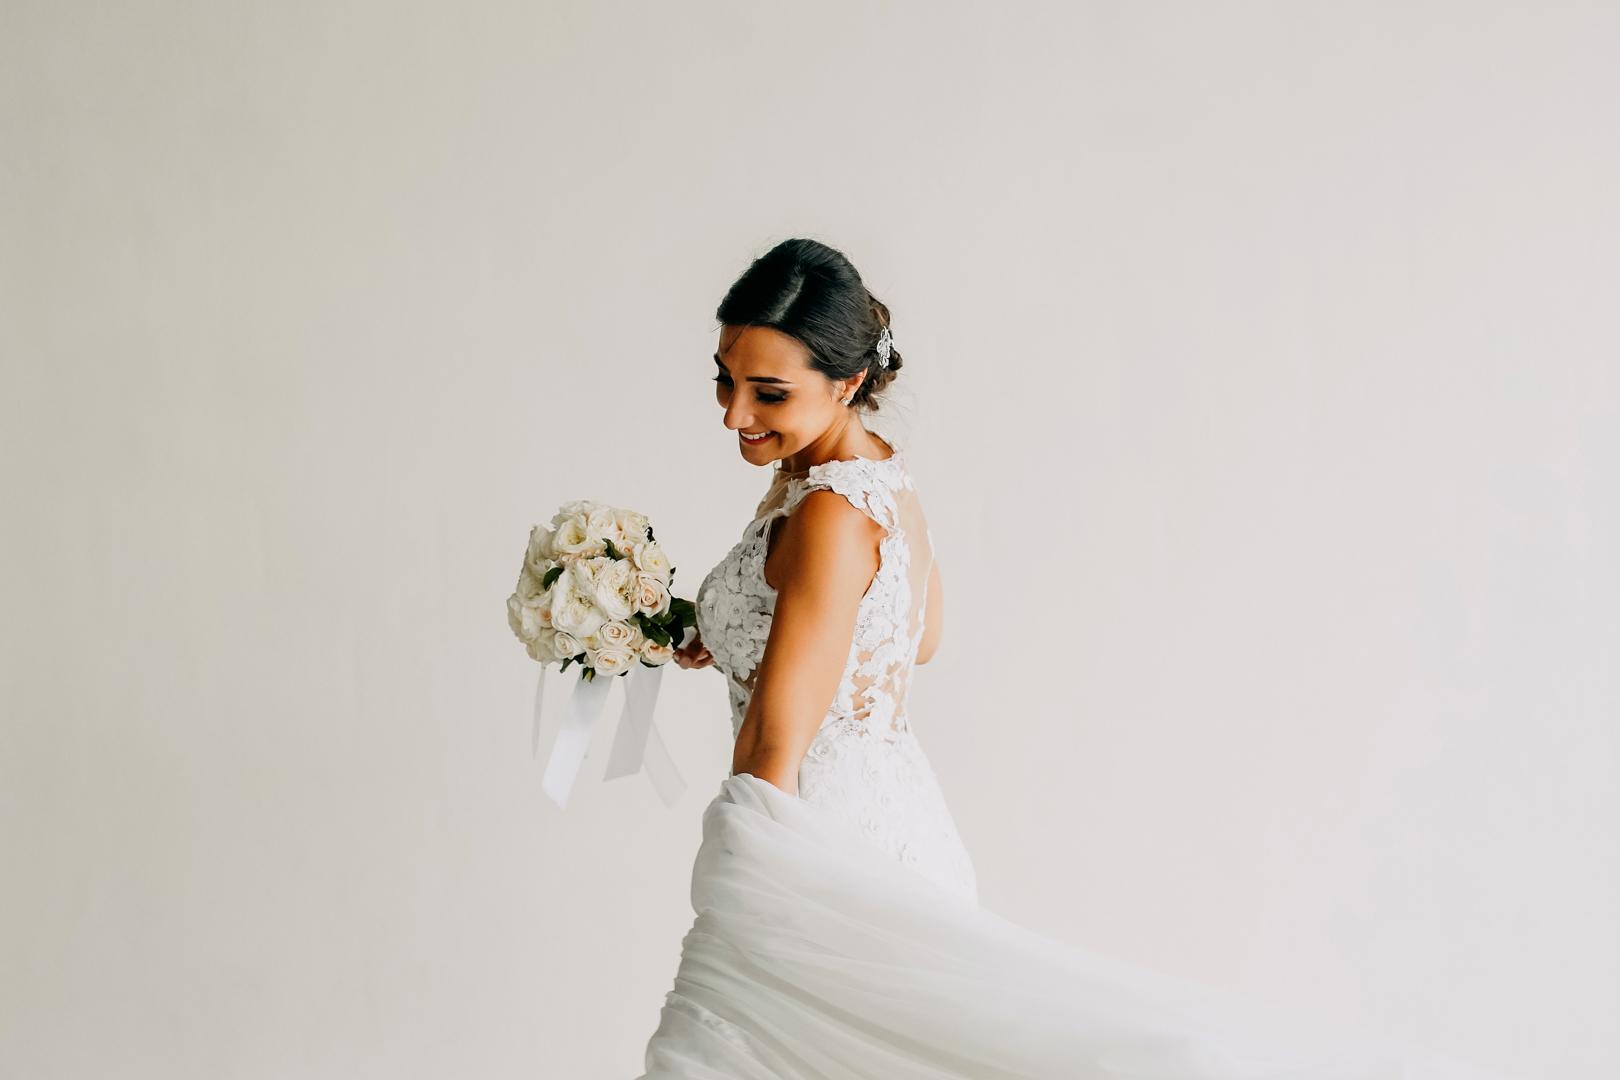 62 gianni-lepore-fotografo-sposi-bride-groom-new-lions-inetrni